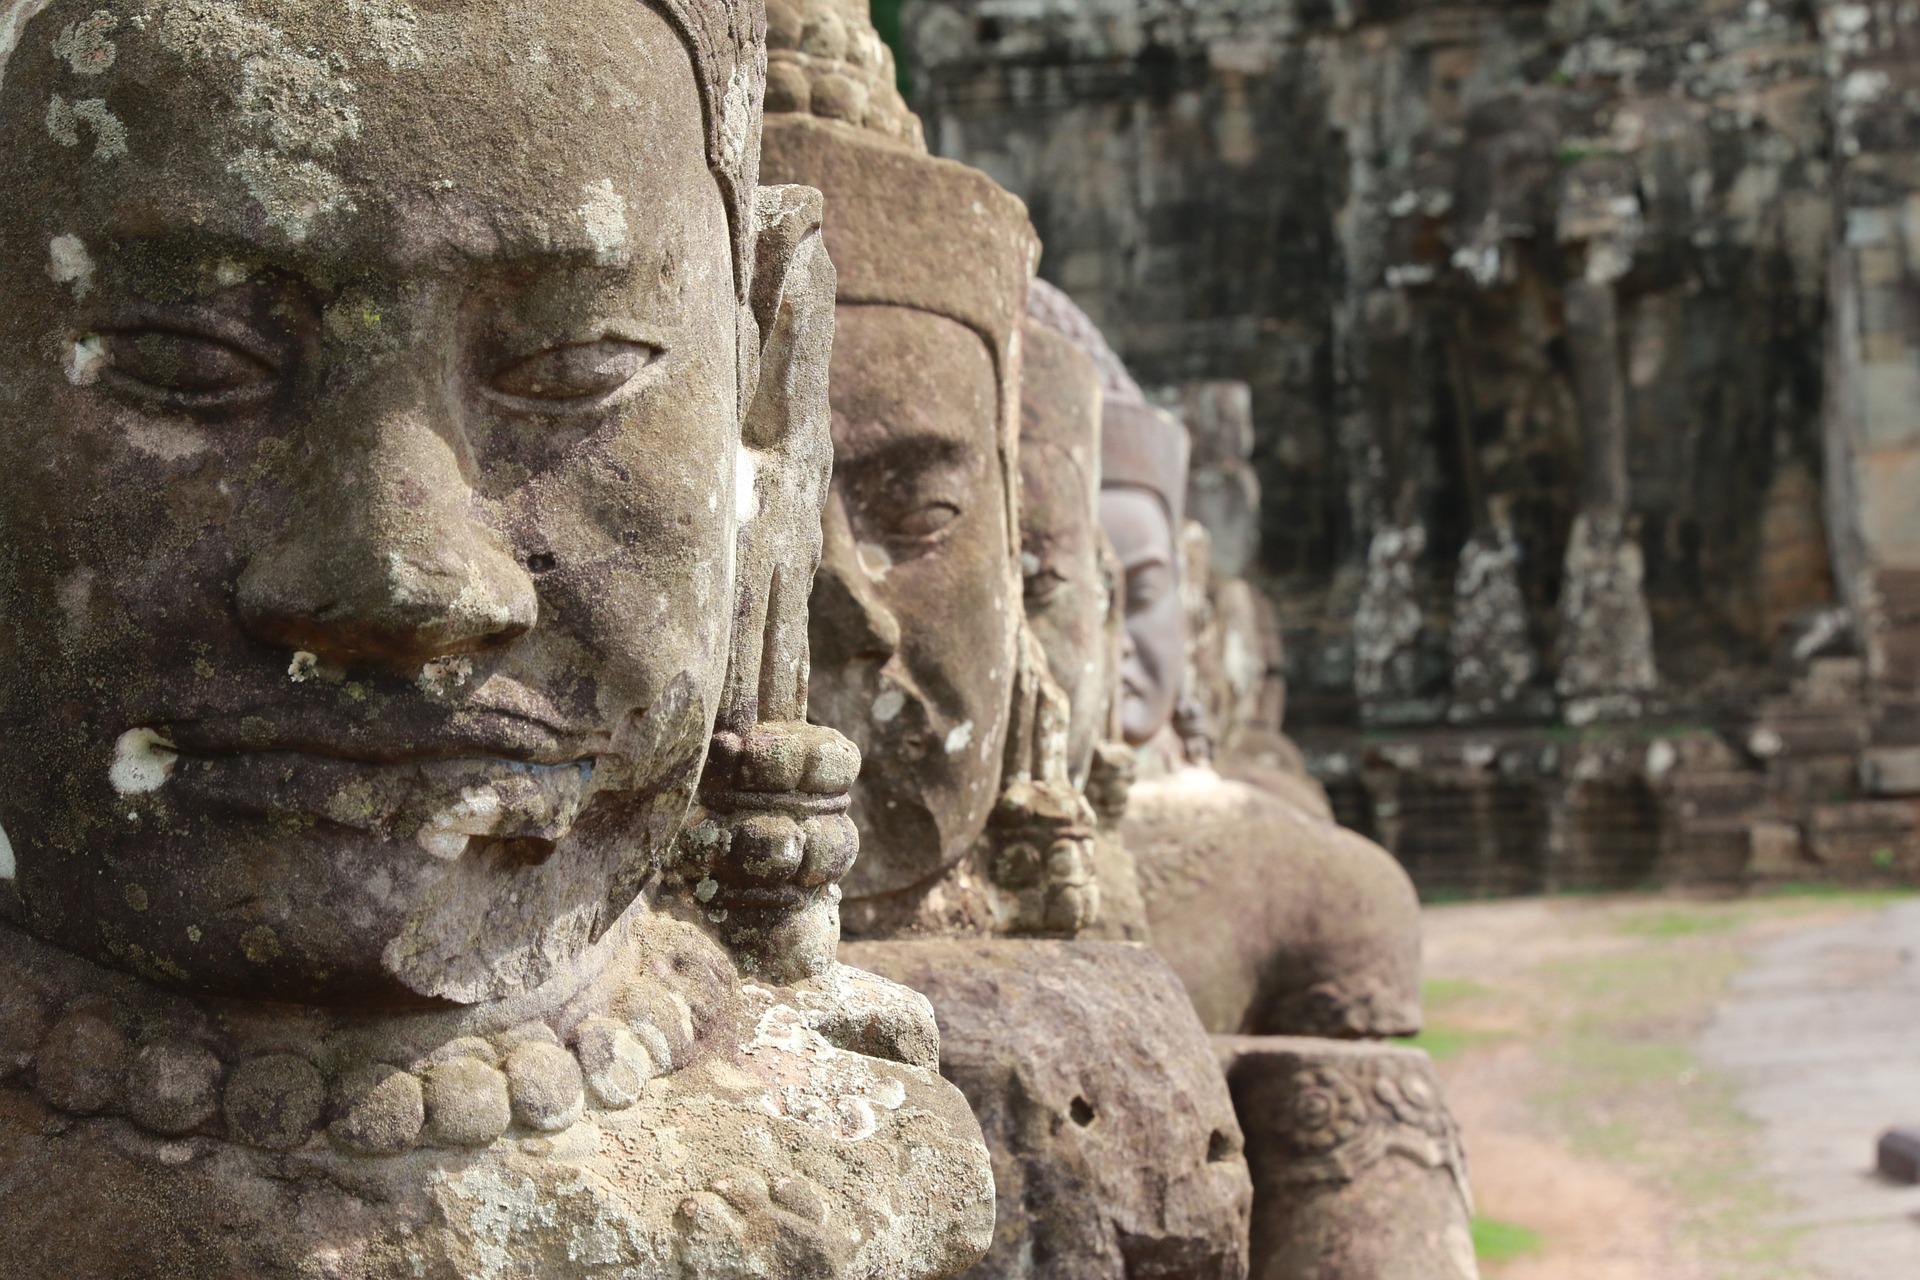 Camboja, Angkor, escultura, Templo de, Ásia - Papéis de parede HD - Professor-falken.com